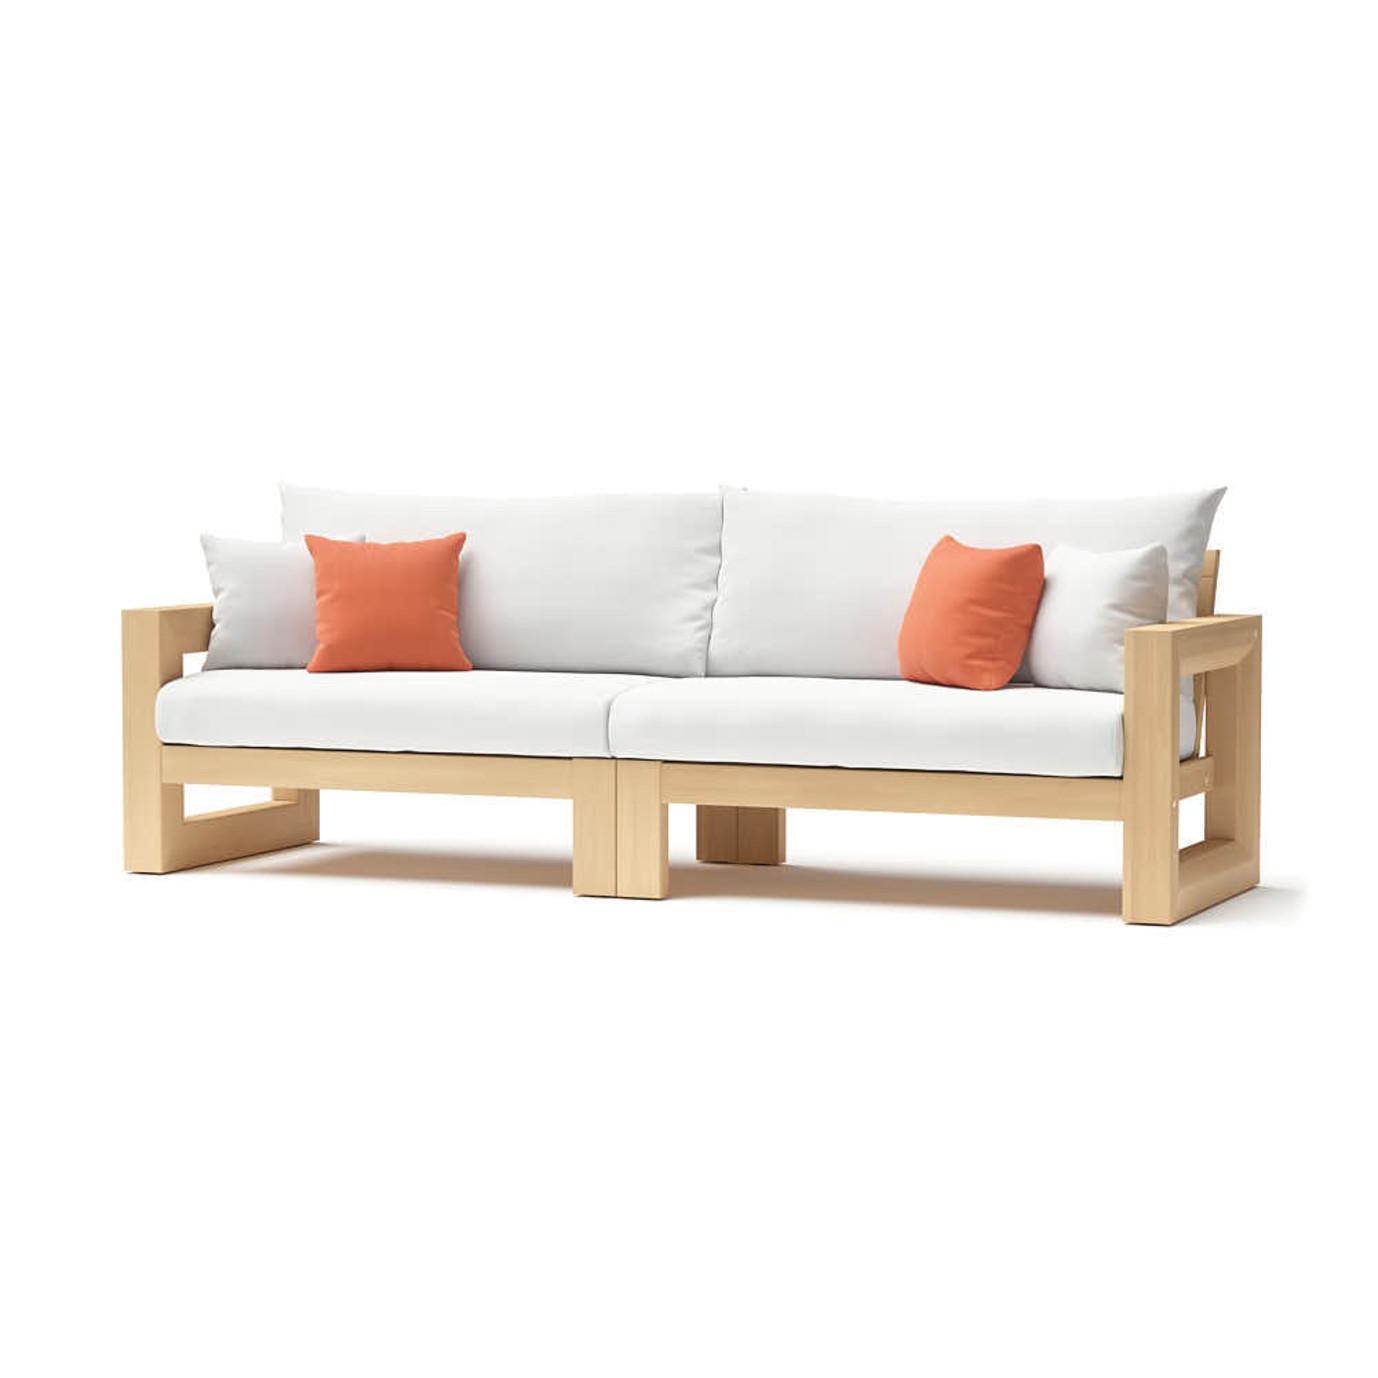 Benson 96in Sofa